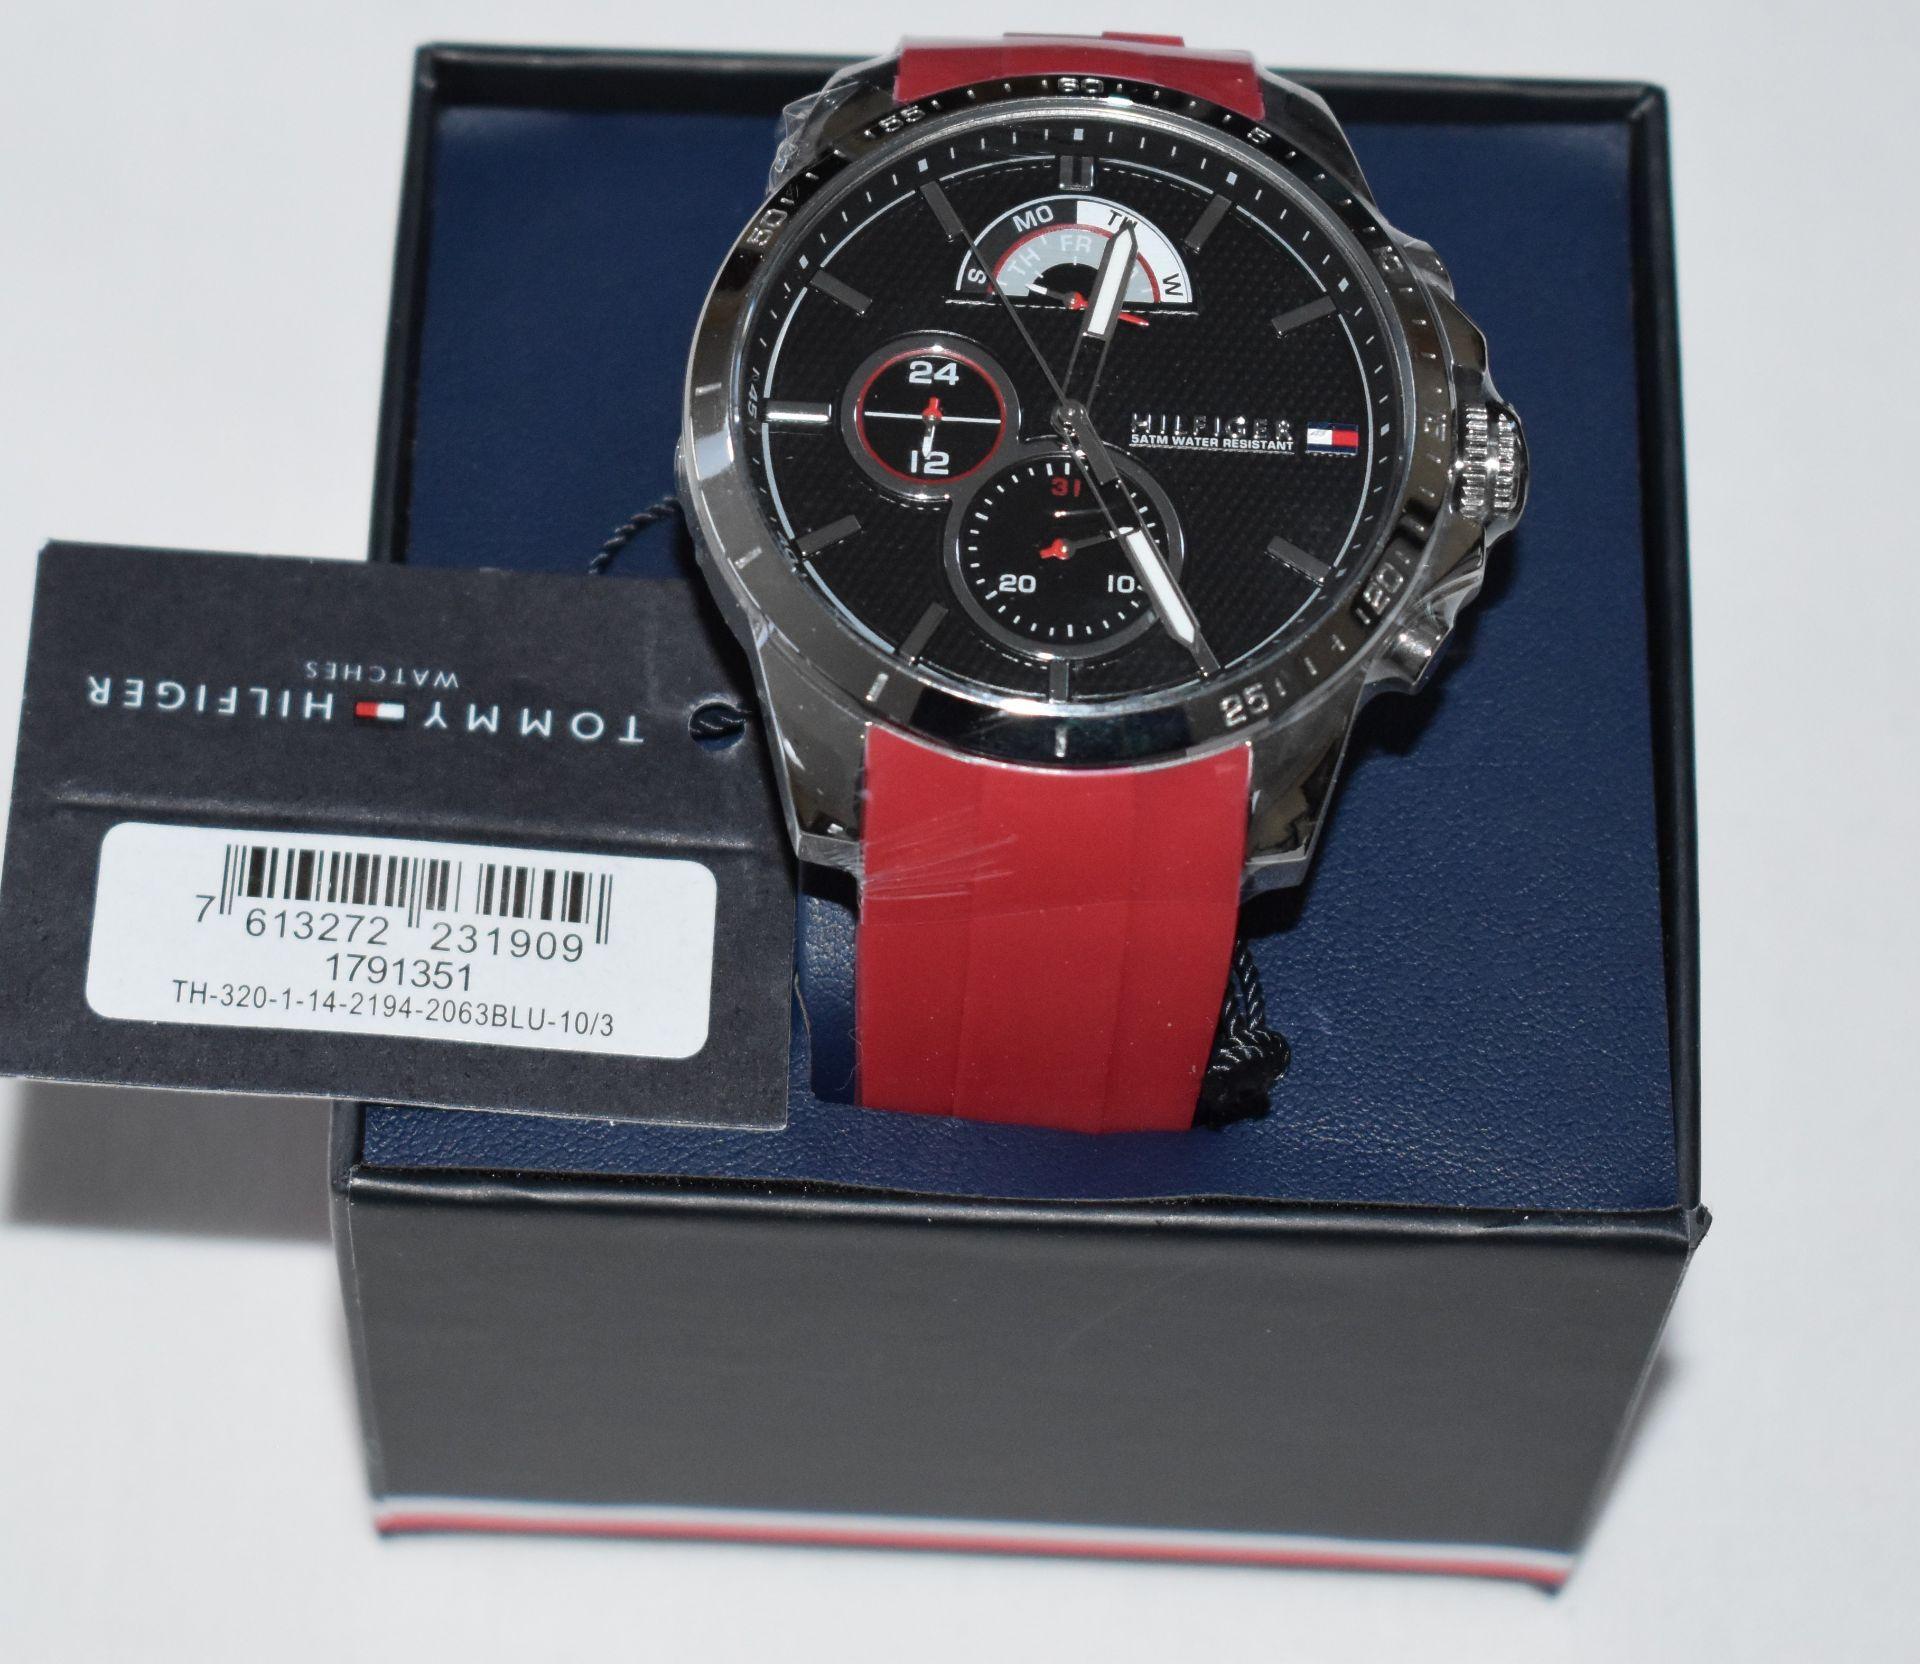 Tommy Hilfiger Men's Watch 1791351 - Image 2 of 2